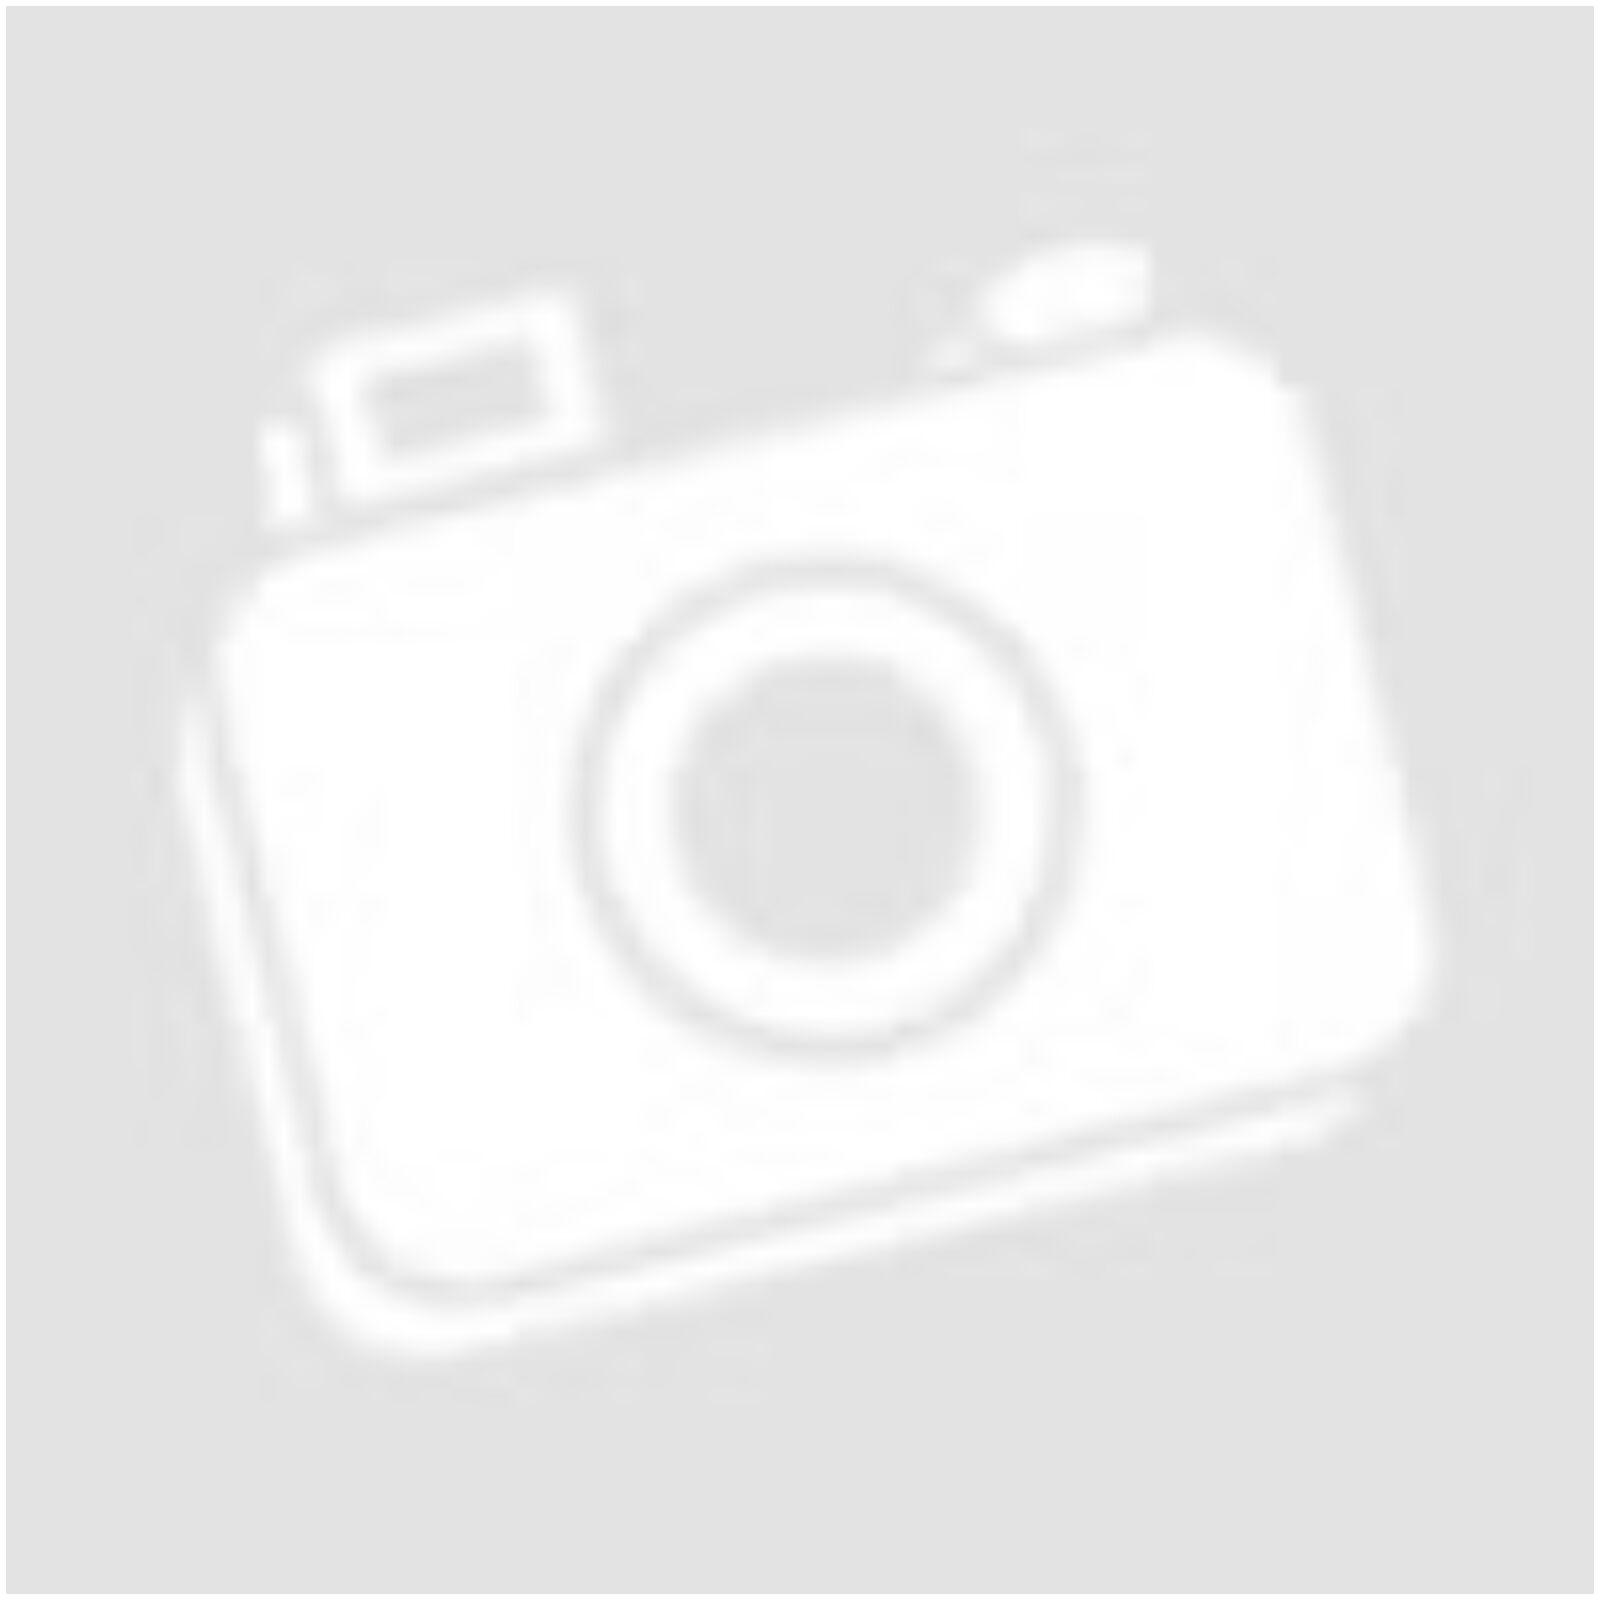 HARZO-3 Plusz Struktúr bevonat [6 kg]